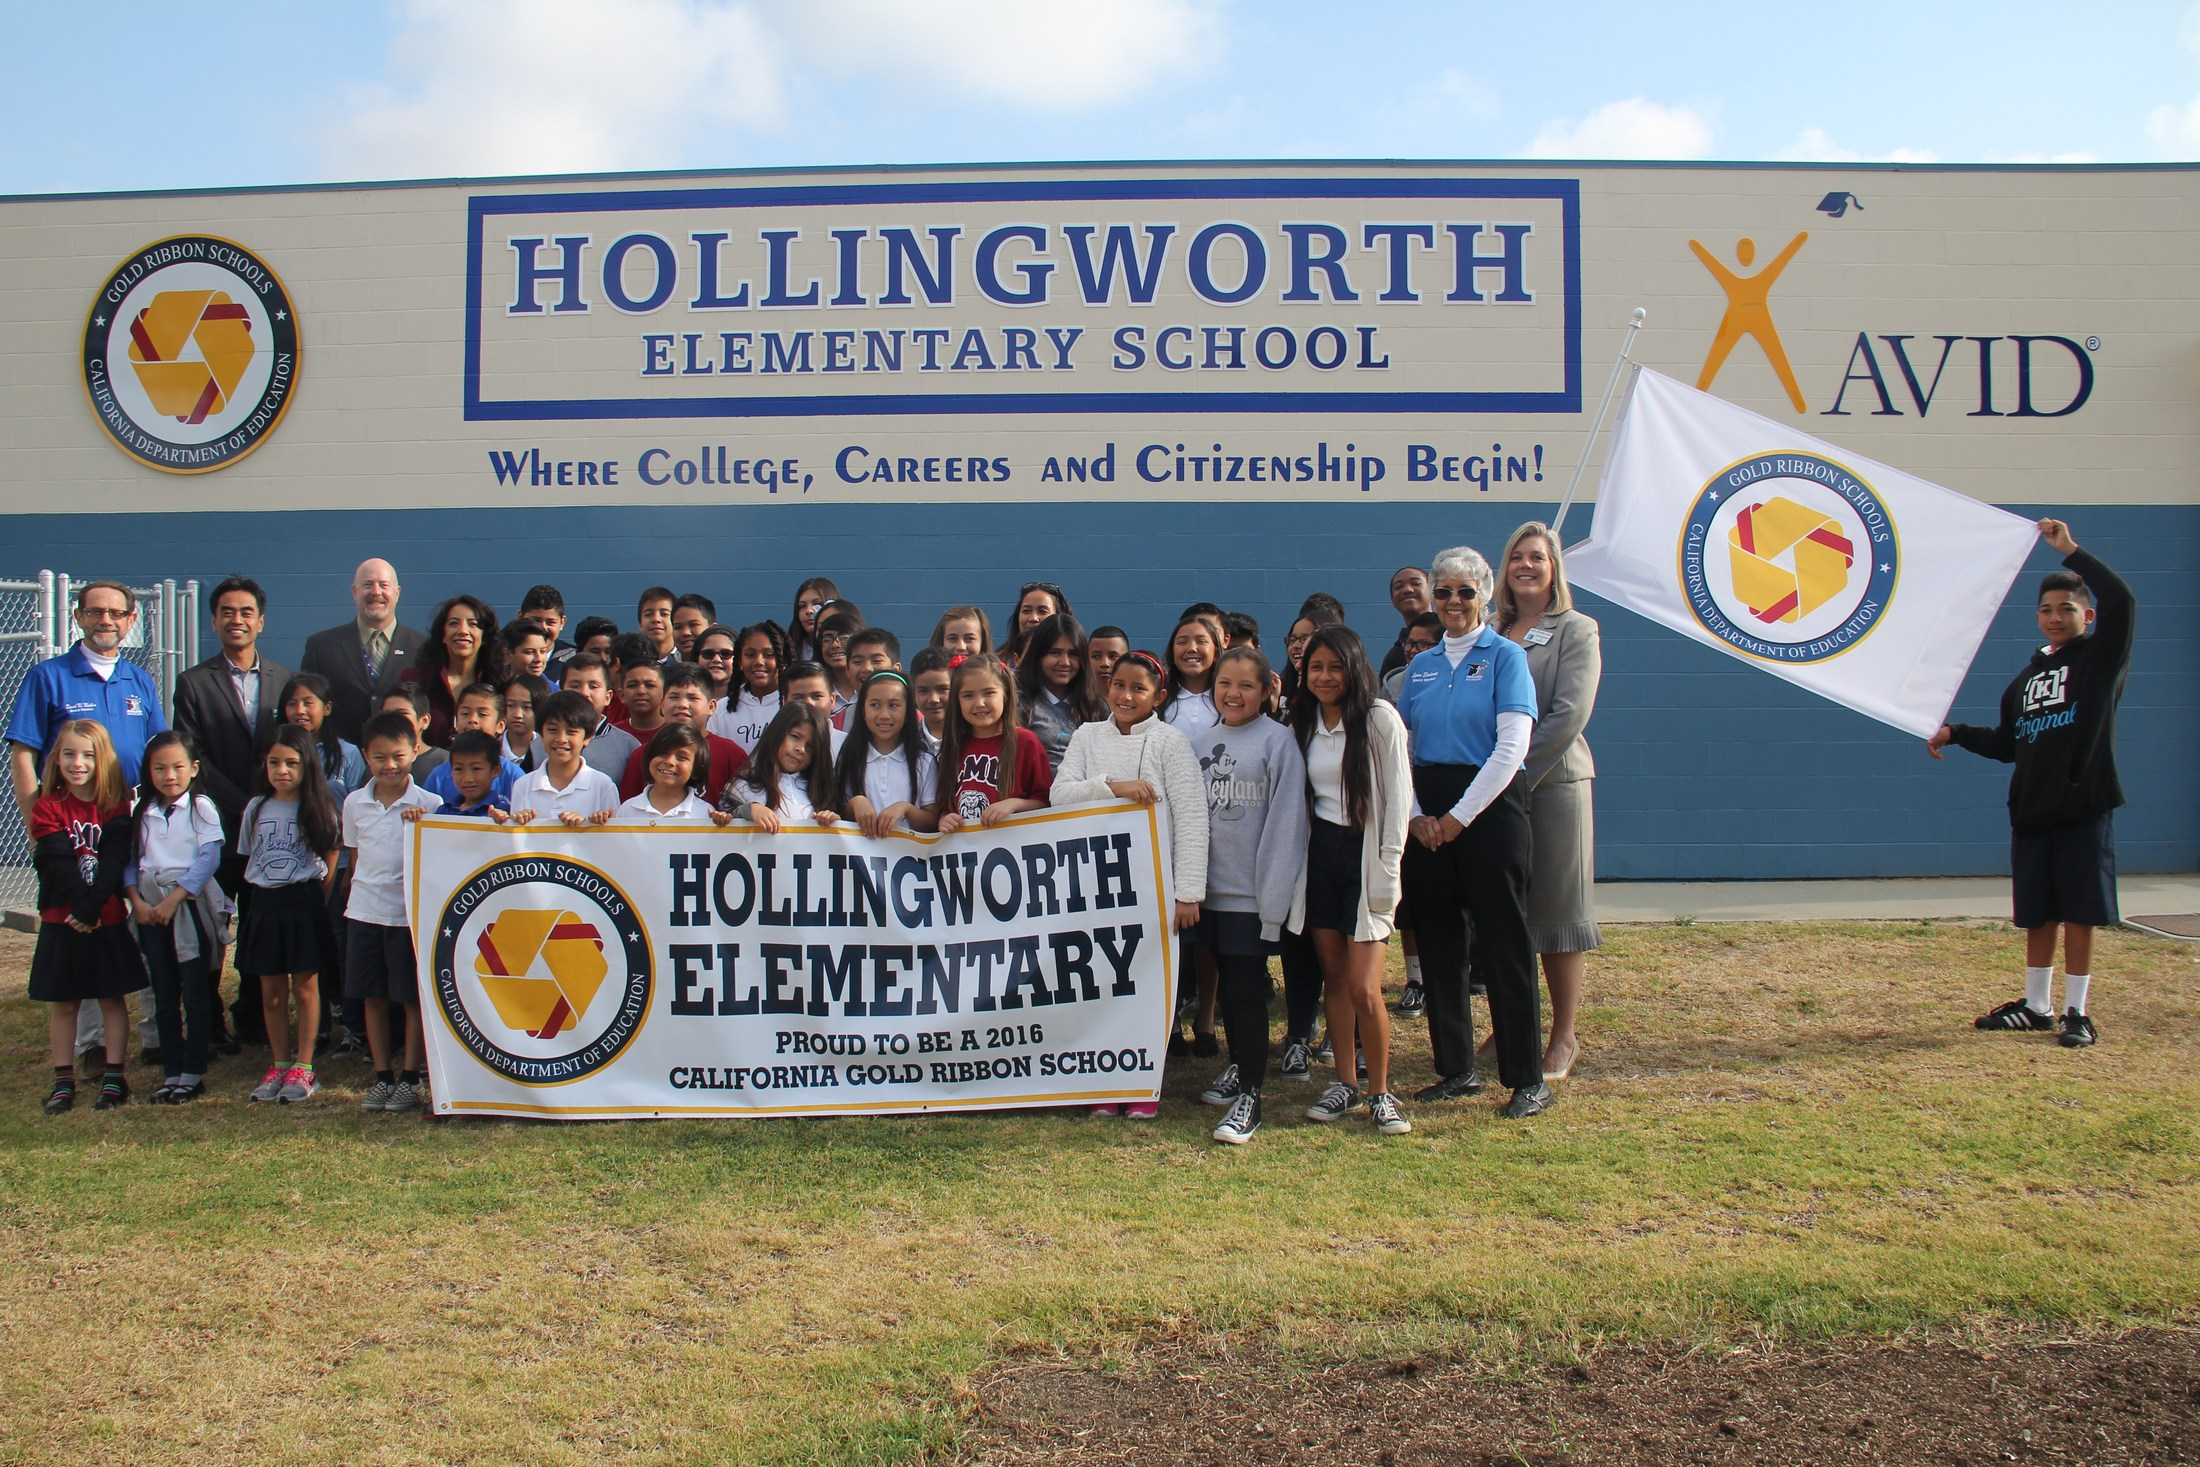 2016 california gold ribbon schools 7 elementary schools about